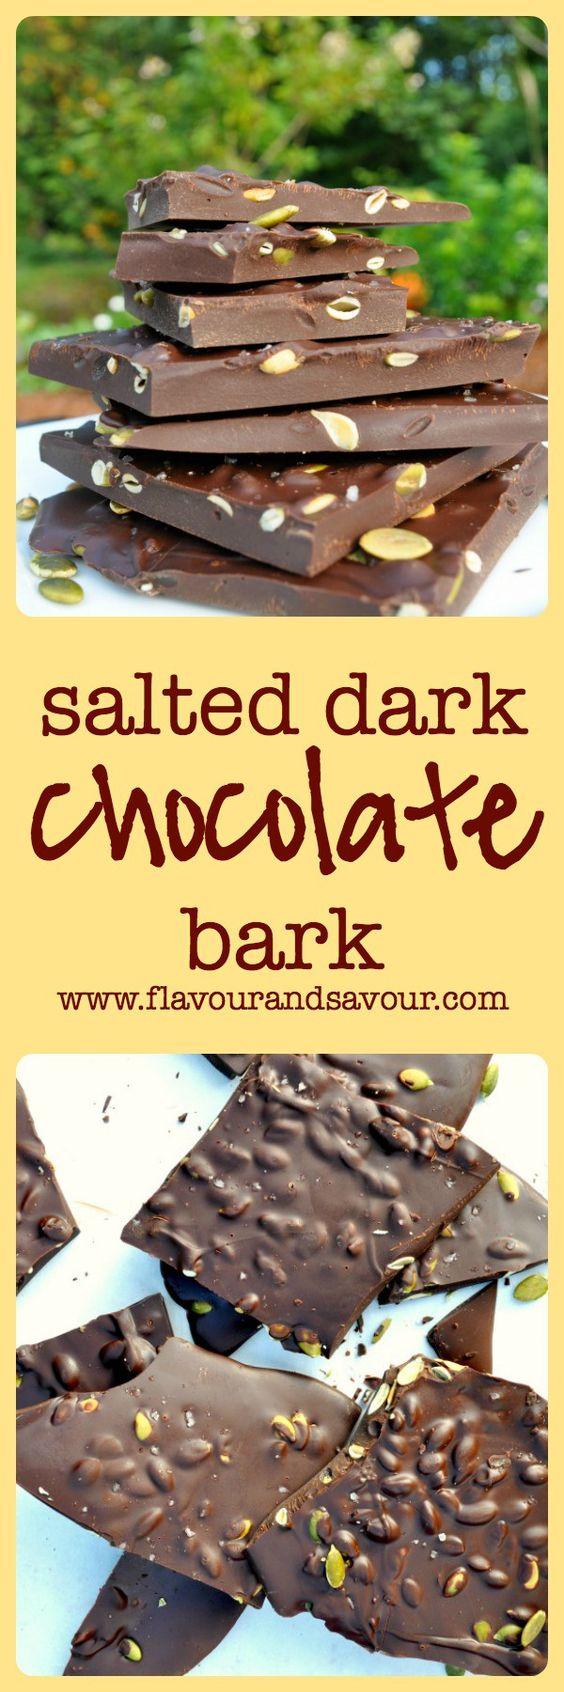 chocolate dark chocolate bark belgian style candy recipe pumpkin seed ...